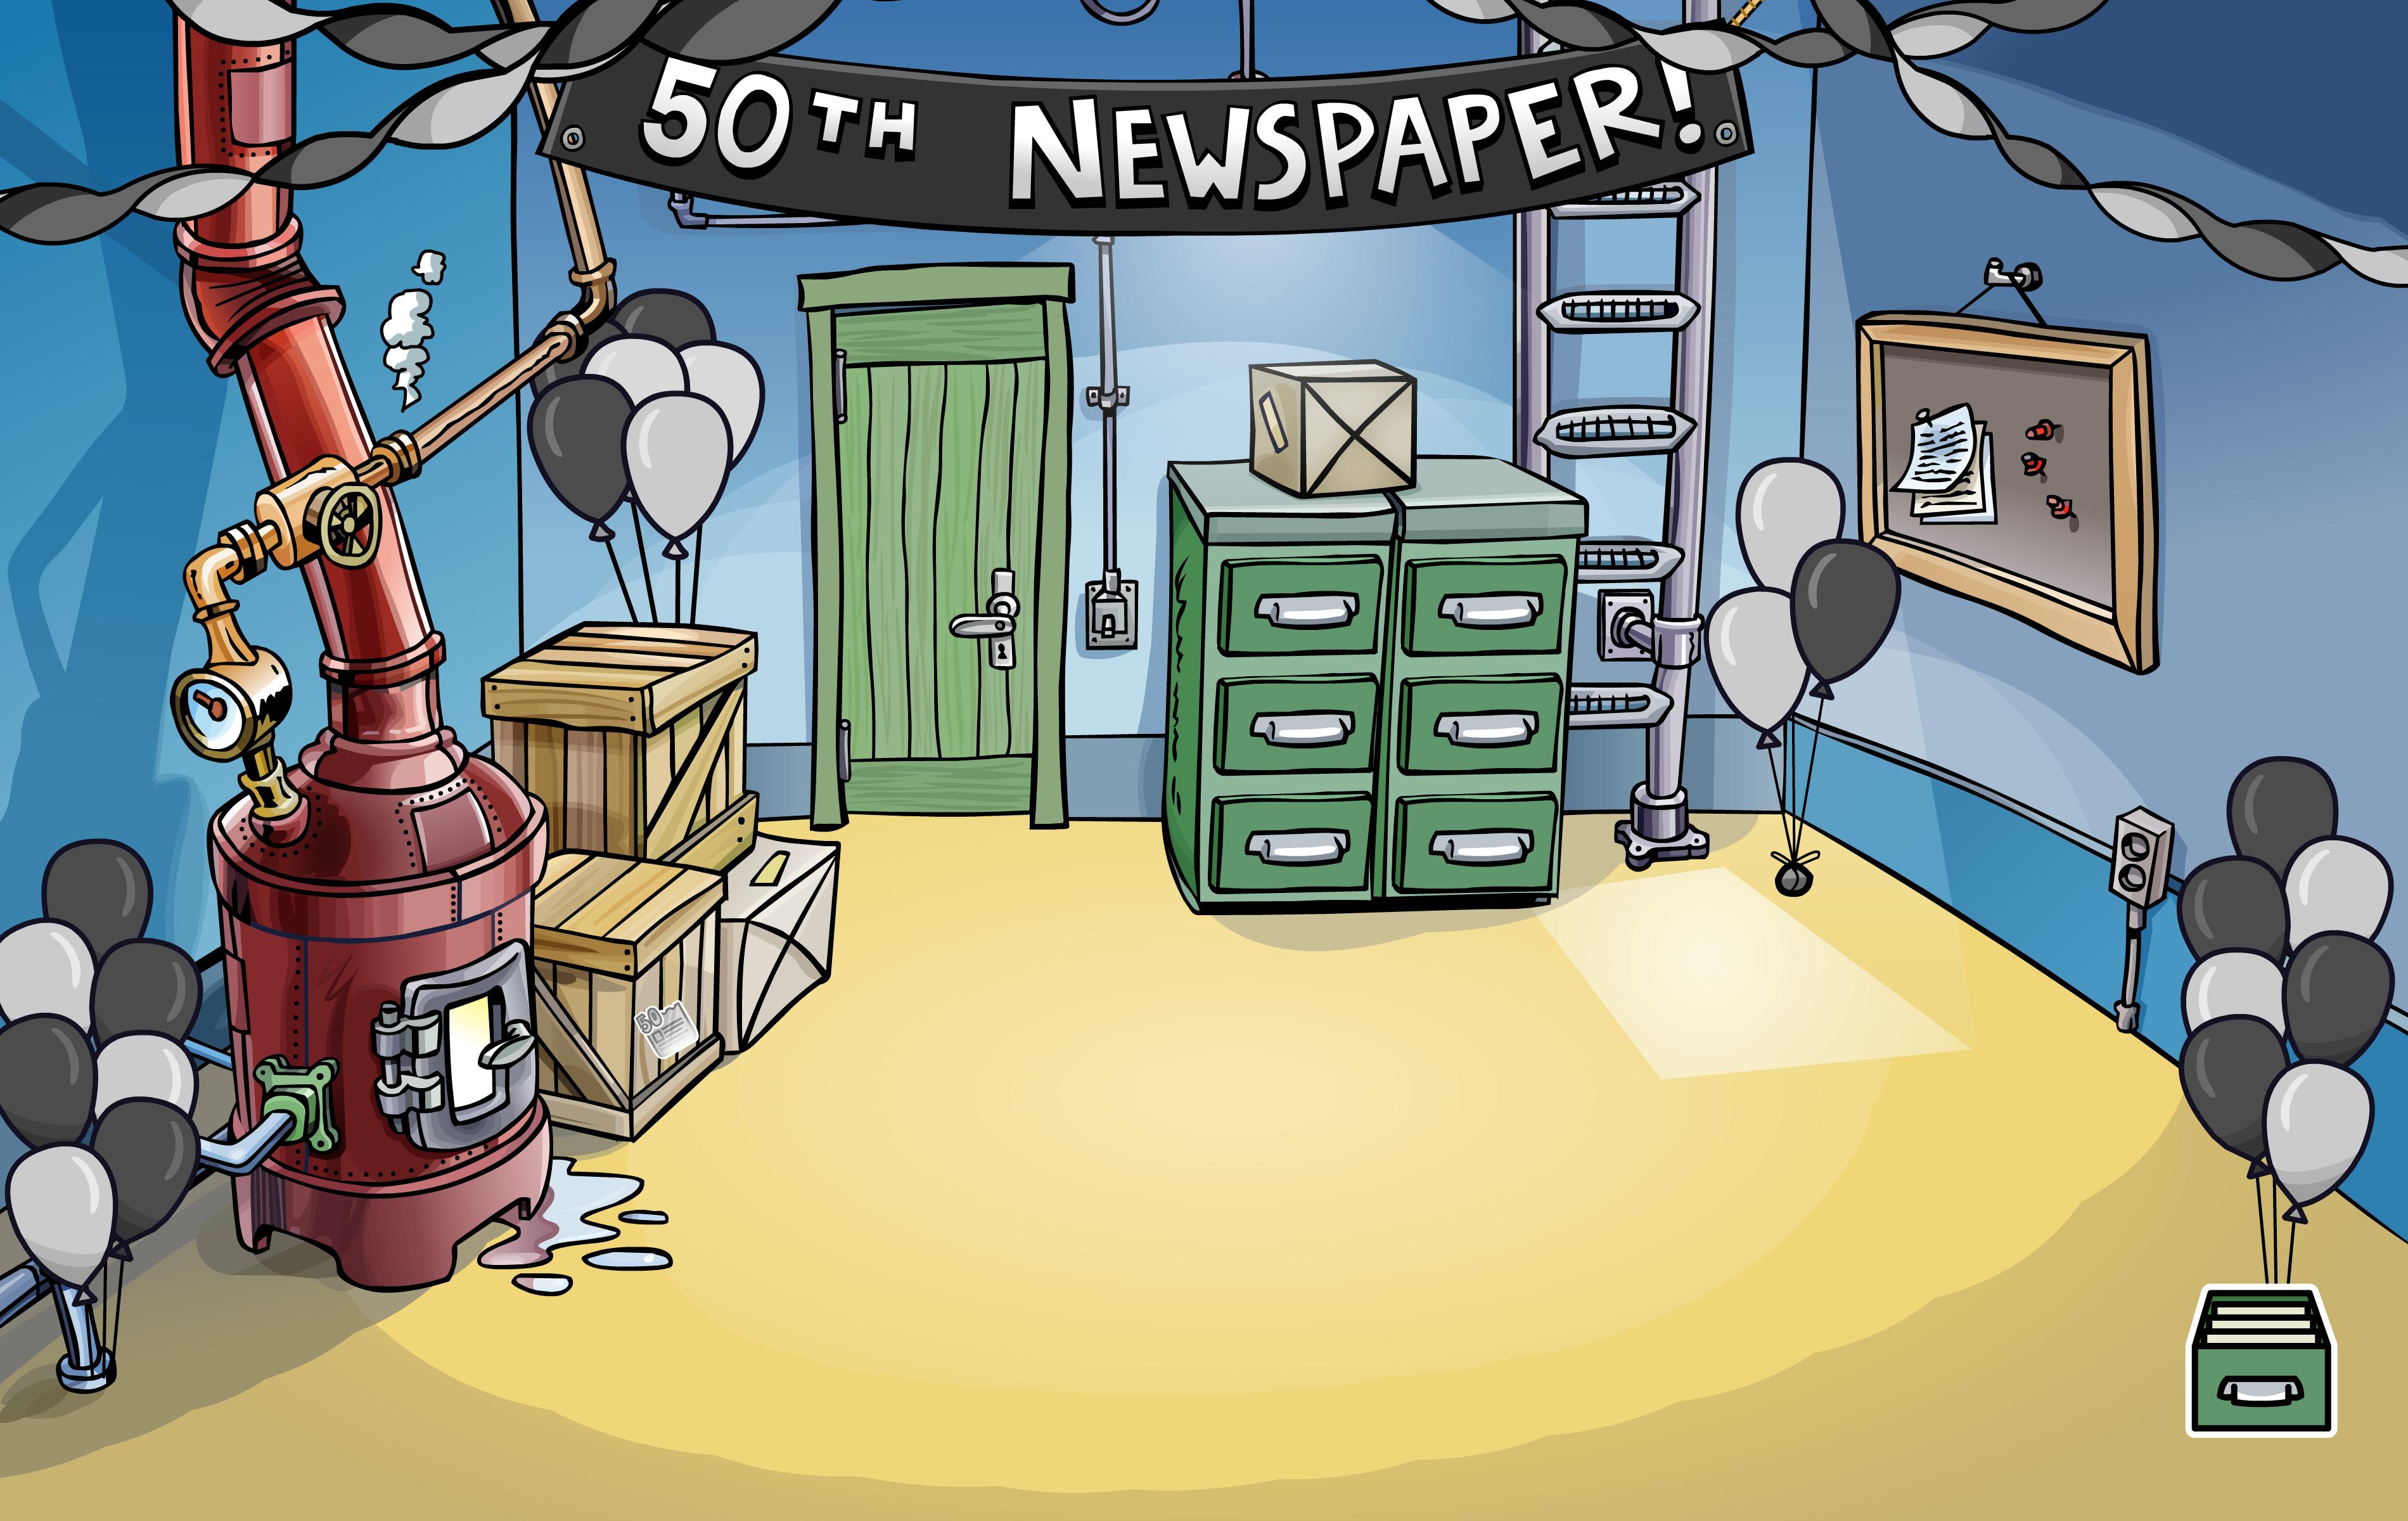 50th Newspaper Event